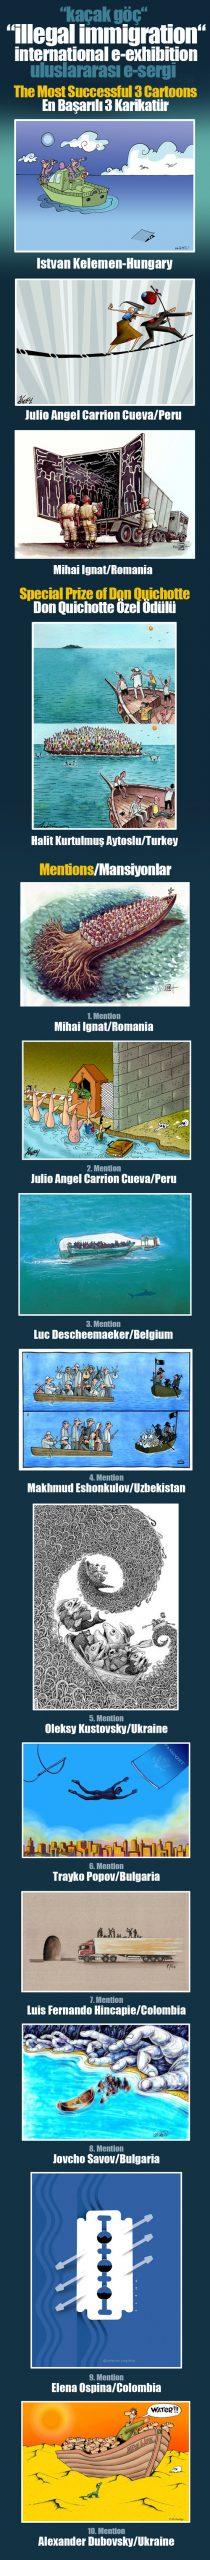 illegalimmigration-allprizes-dq2.jpg